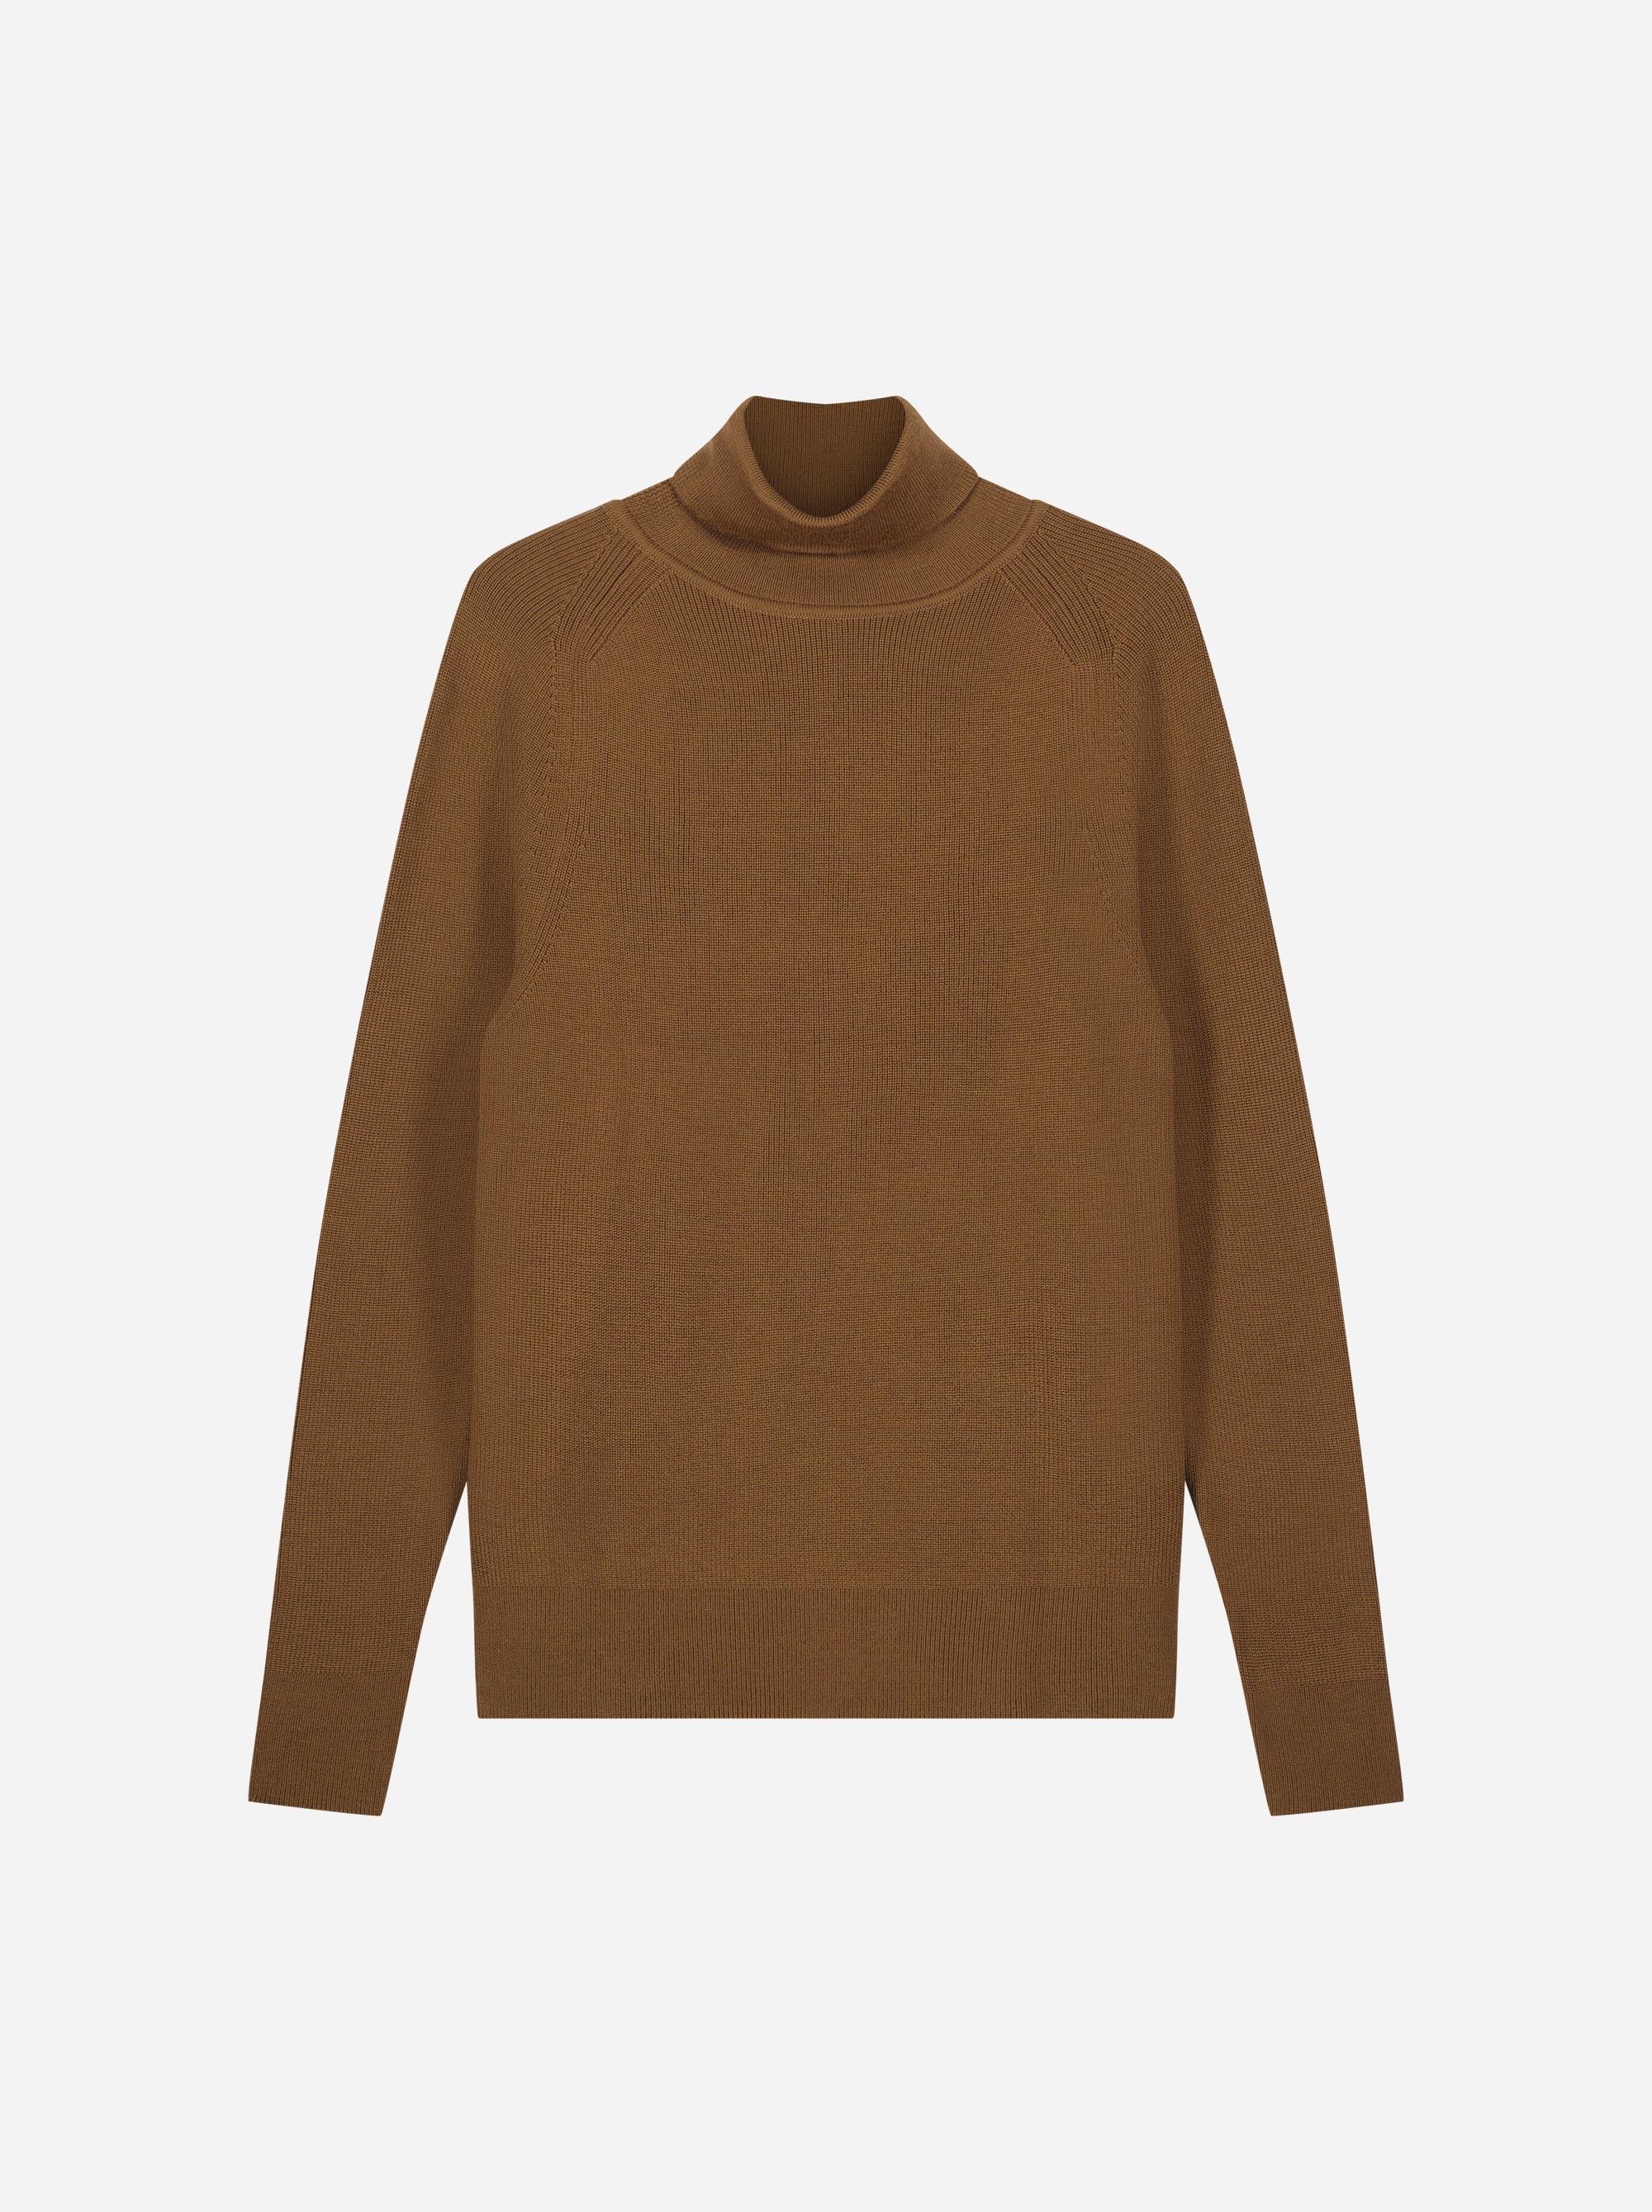 Teym_Merino-Sweater-Turtleneck_Brown_front_1